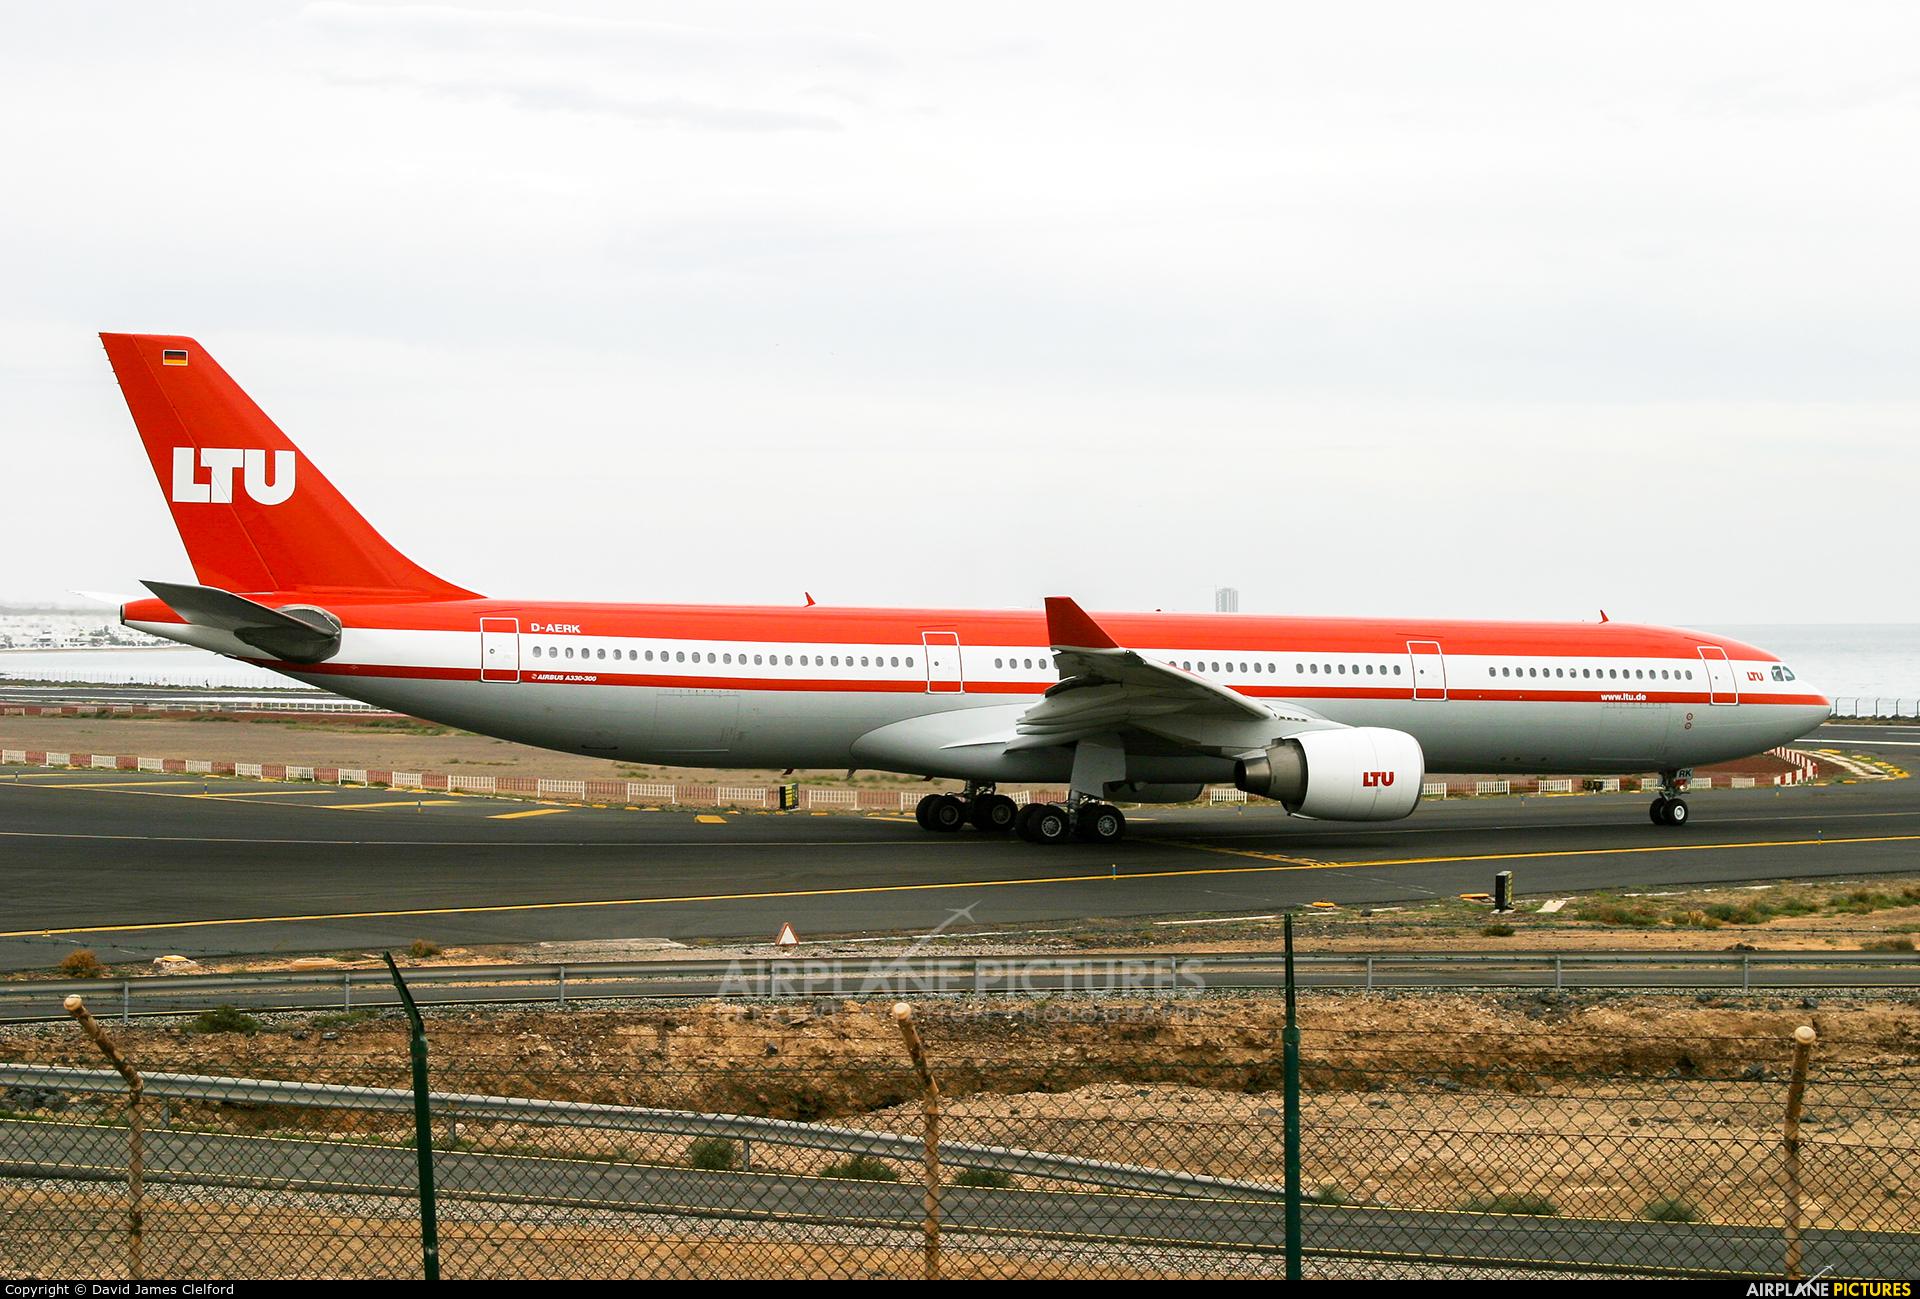 LTU D-AERK aircraft at Lanzarote - Arrecife